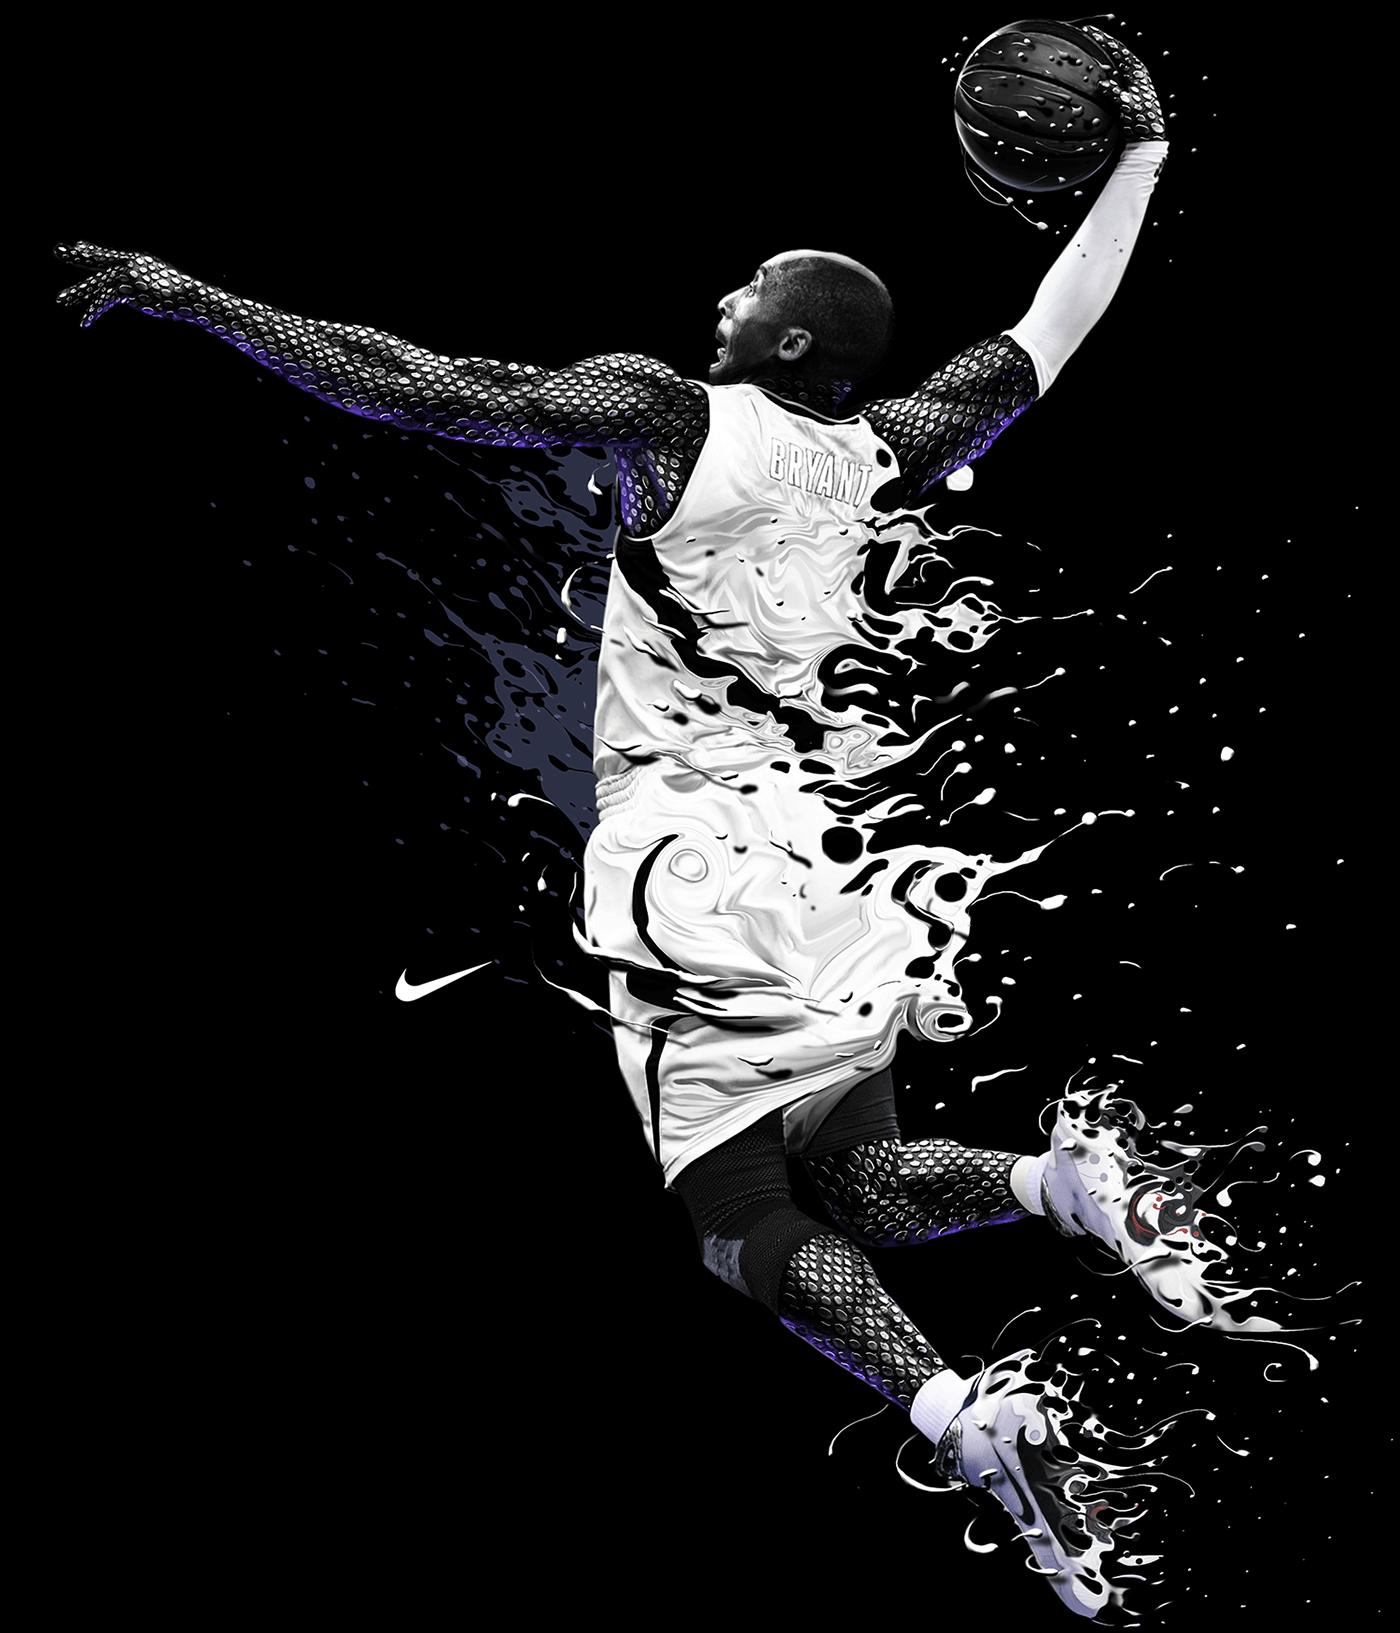 TShirt designs for Nike. Digital illustrations over